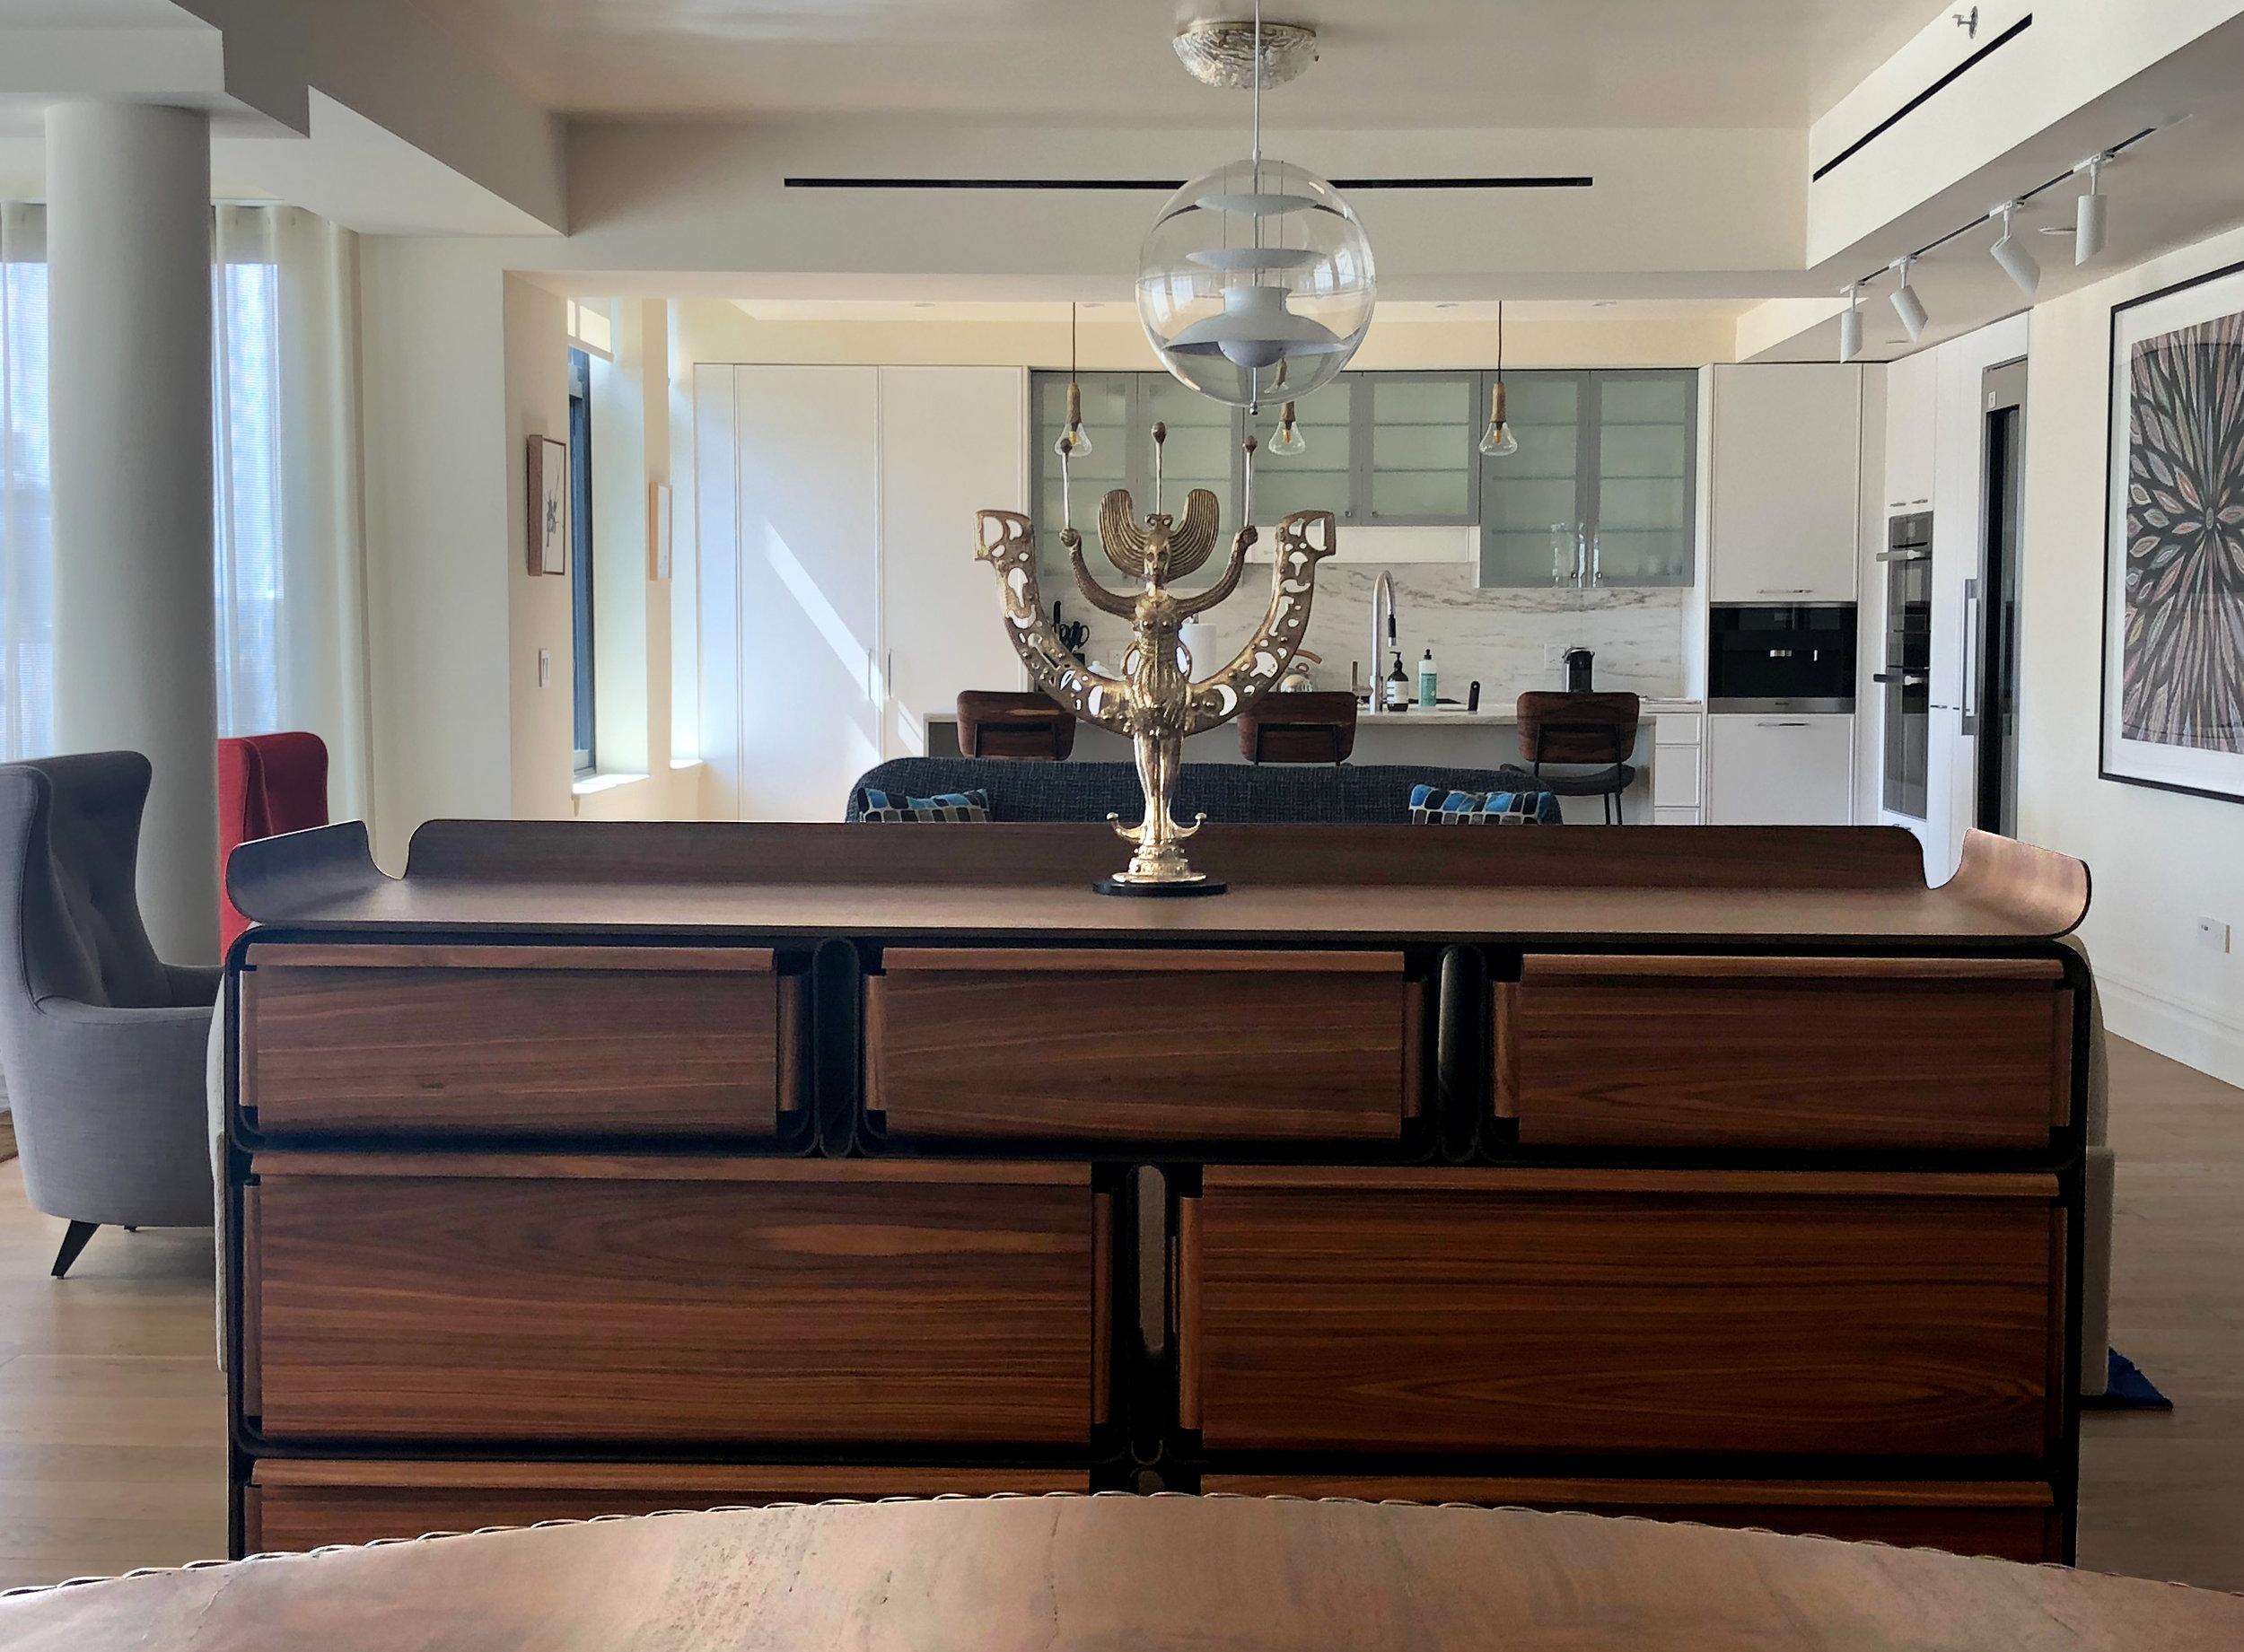 Dining - sideboard & kitchen 2.jpg